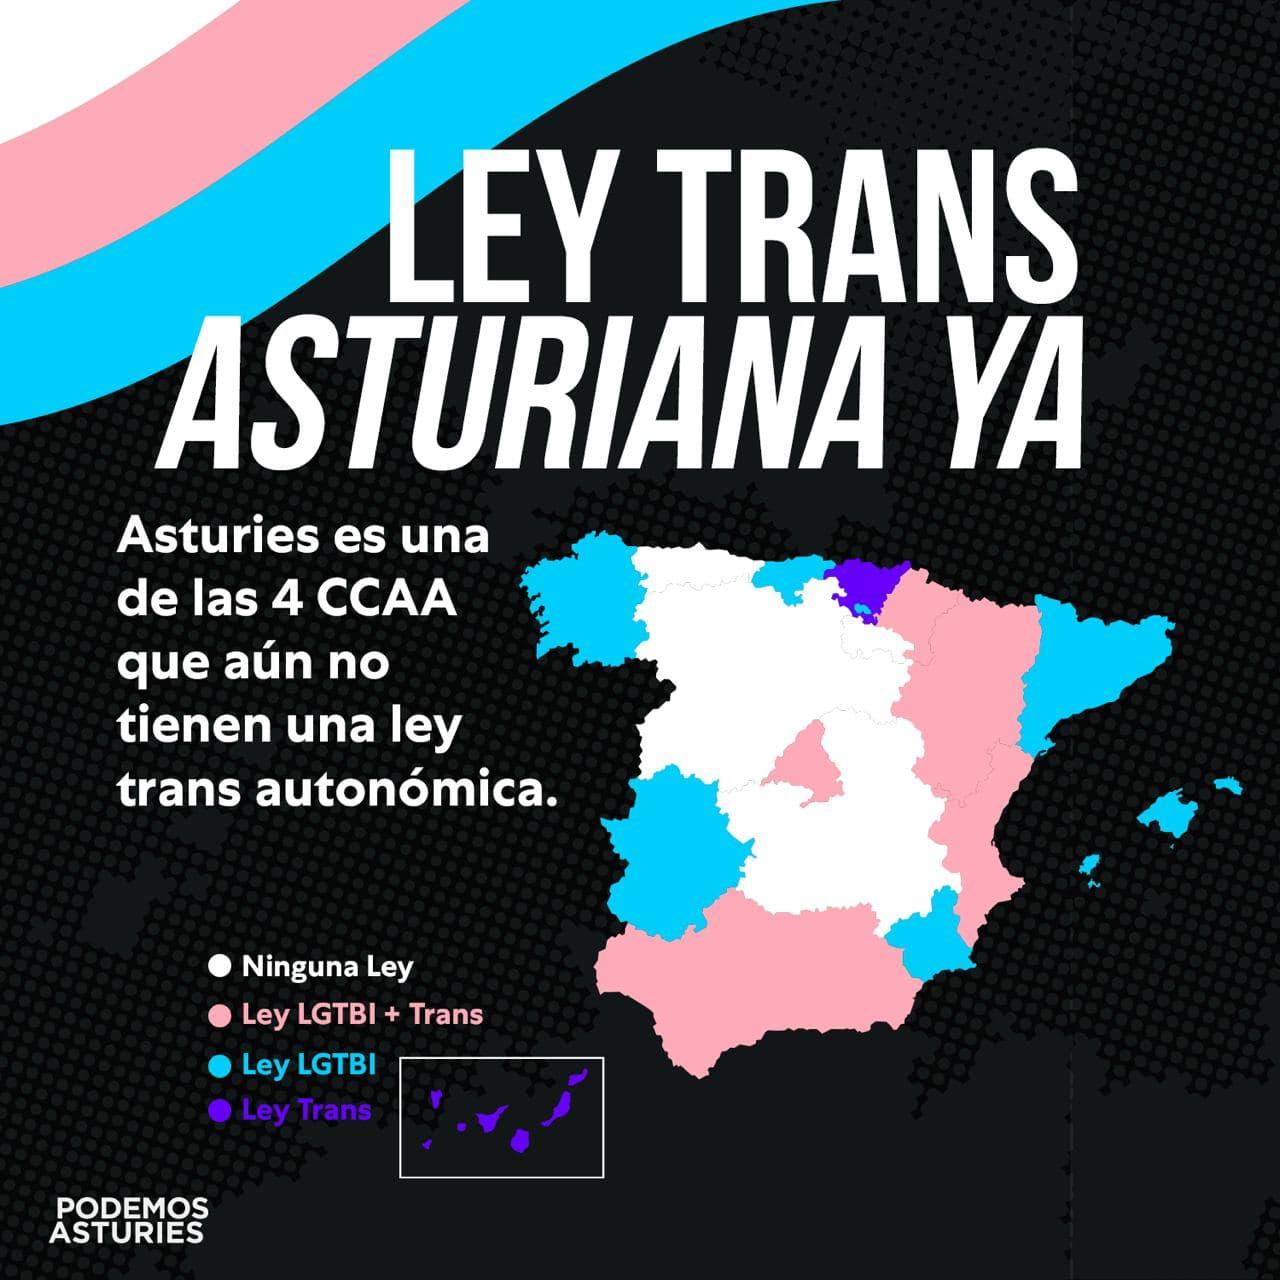 Ley Trans Asturiana Ya